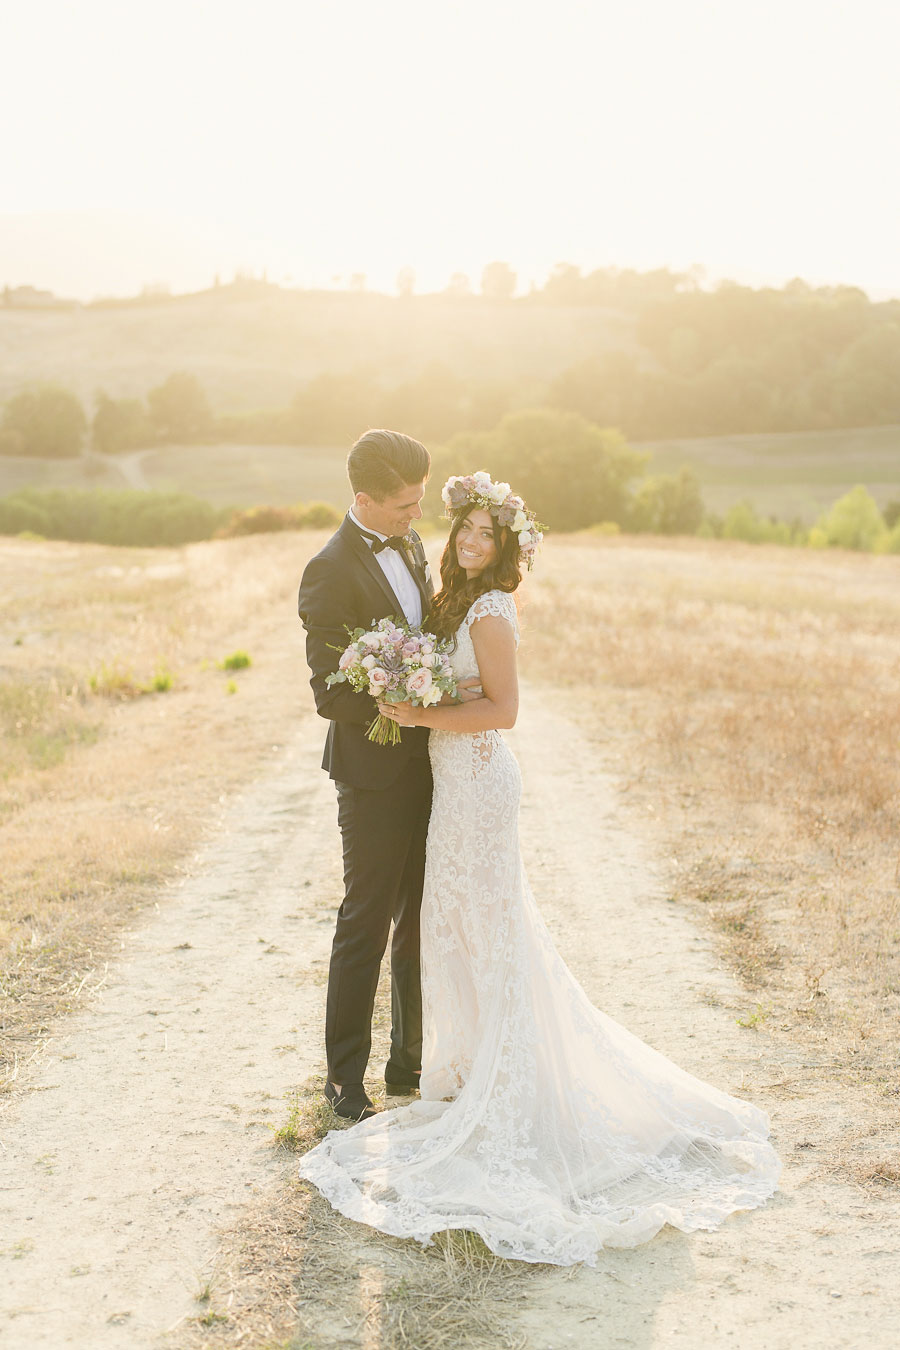 Wedding-Nicholad-and-Federica-Giuseppe-Giovannelli-209